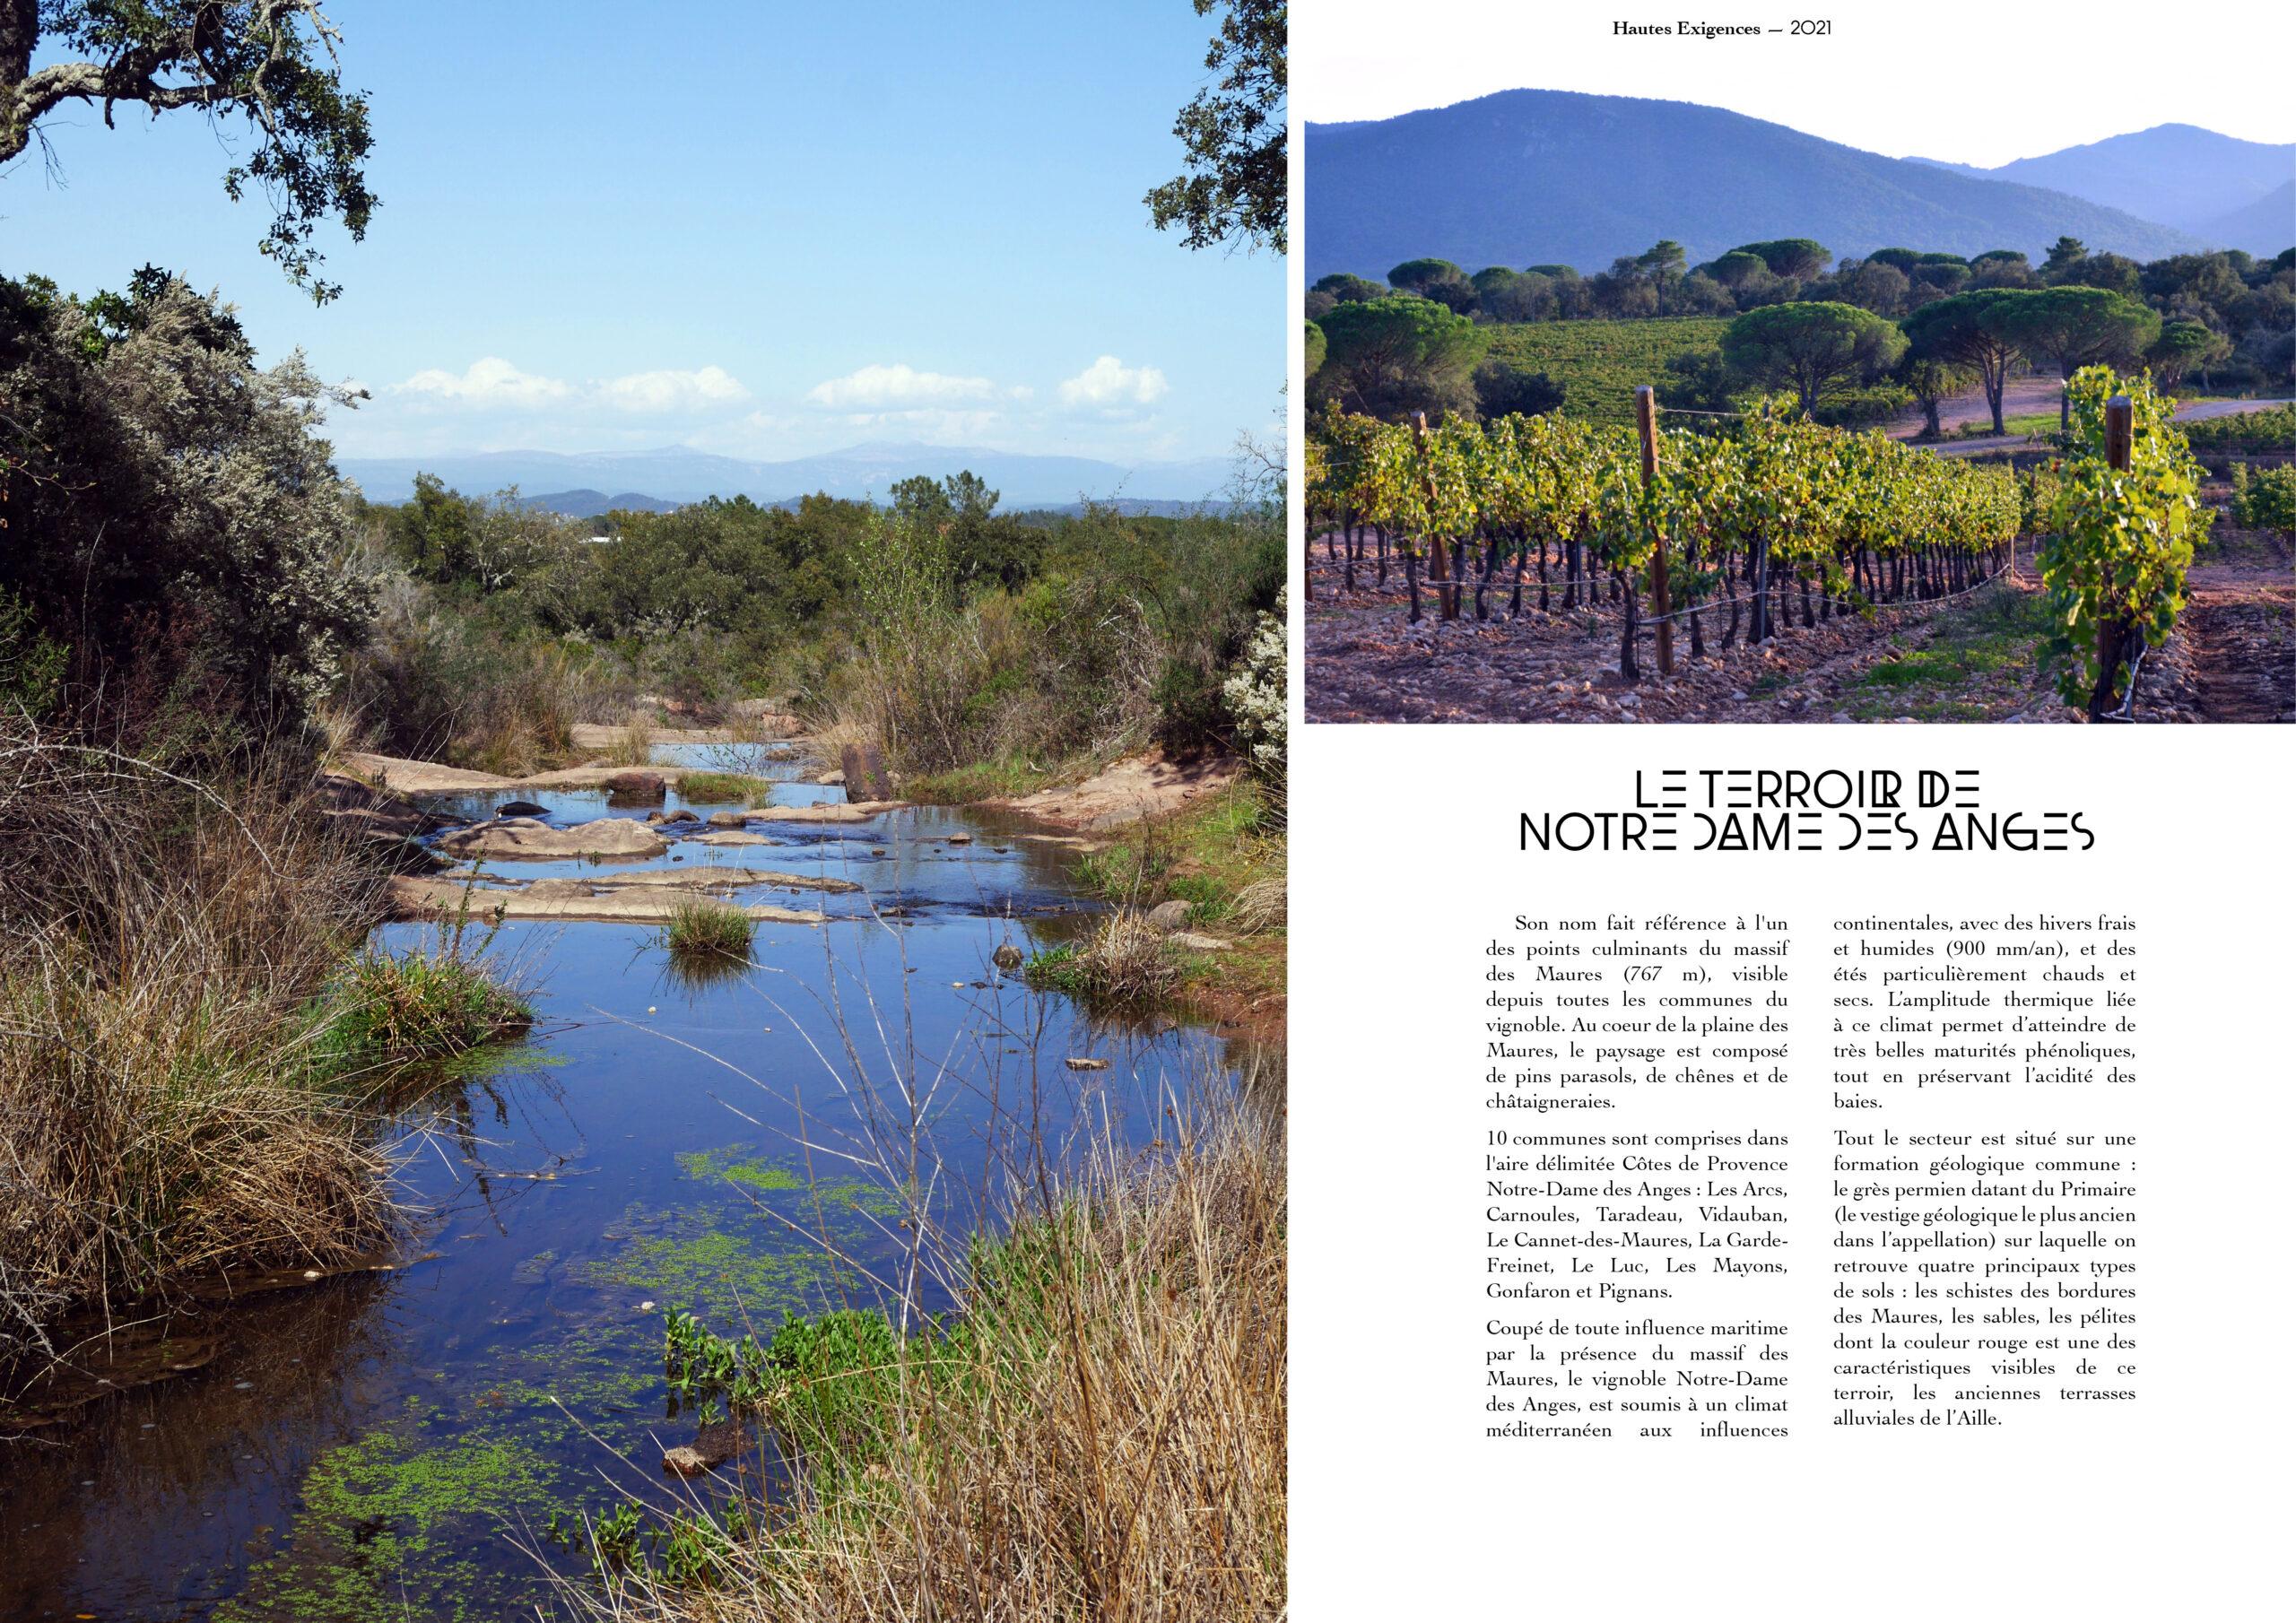 Hautes Exigences Magazine Hors Serie 2021 page 160-161